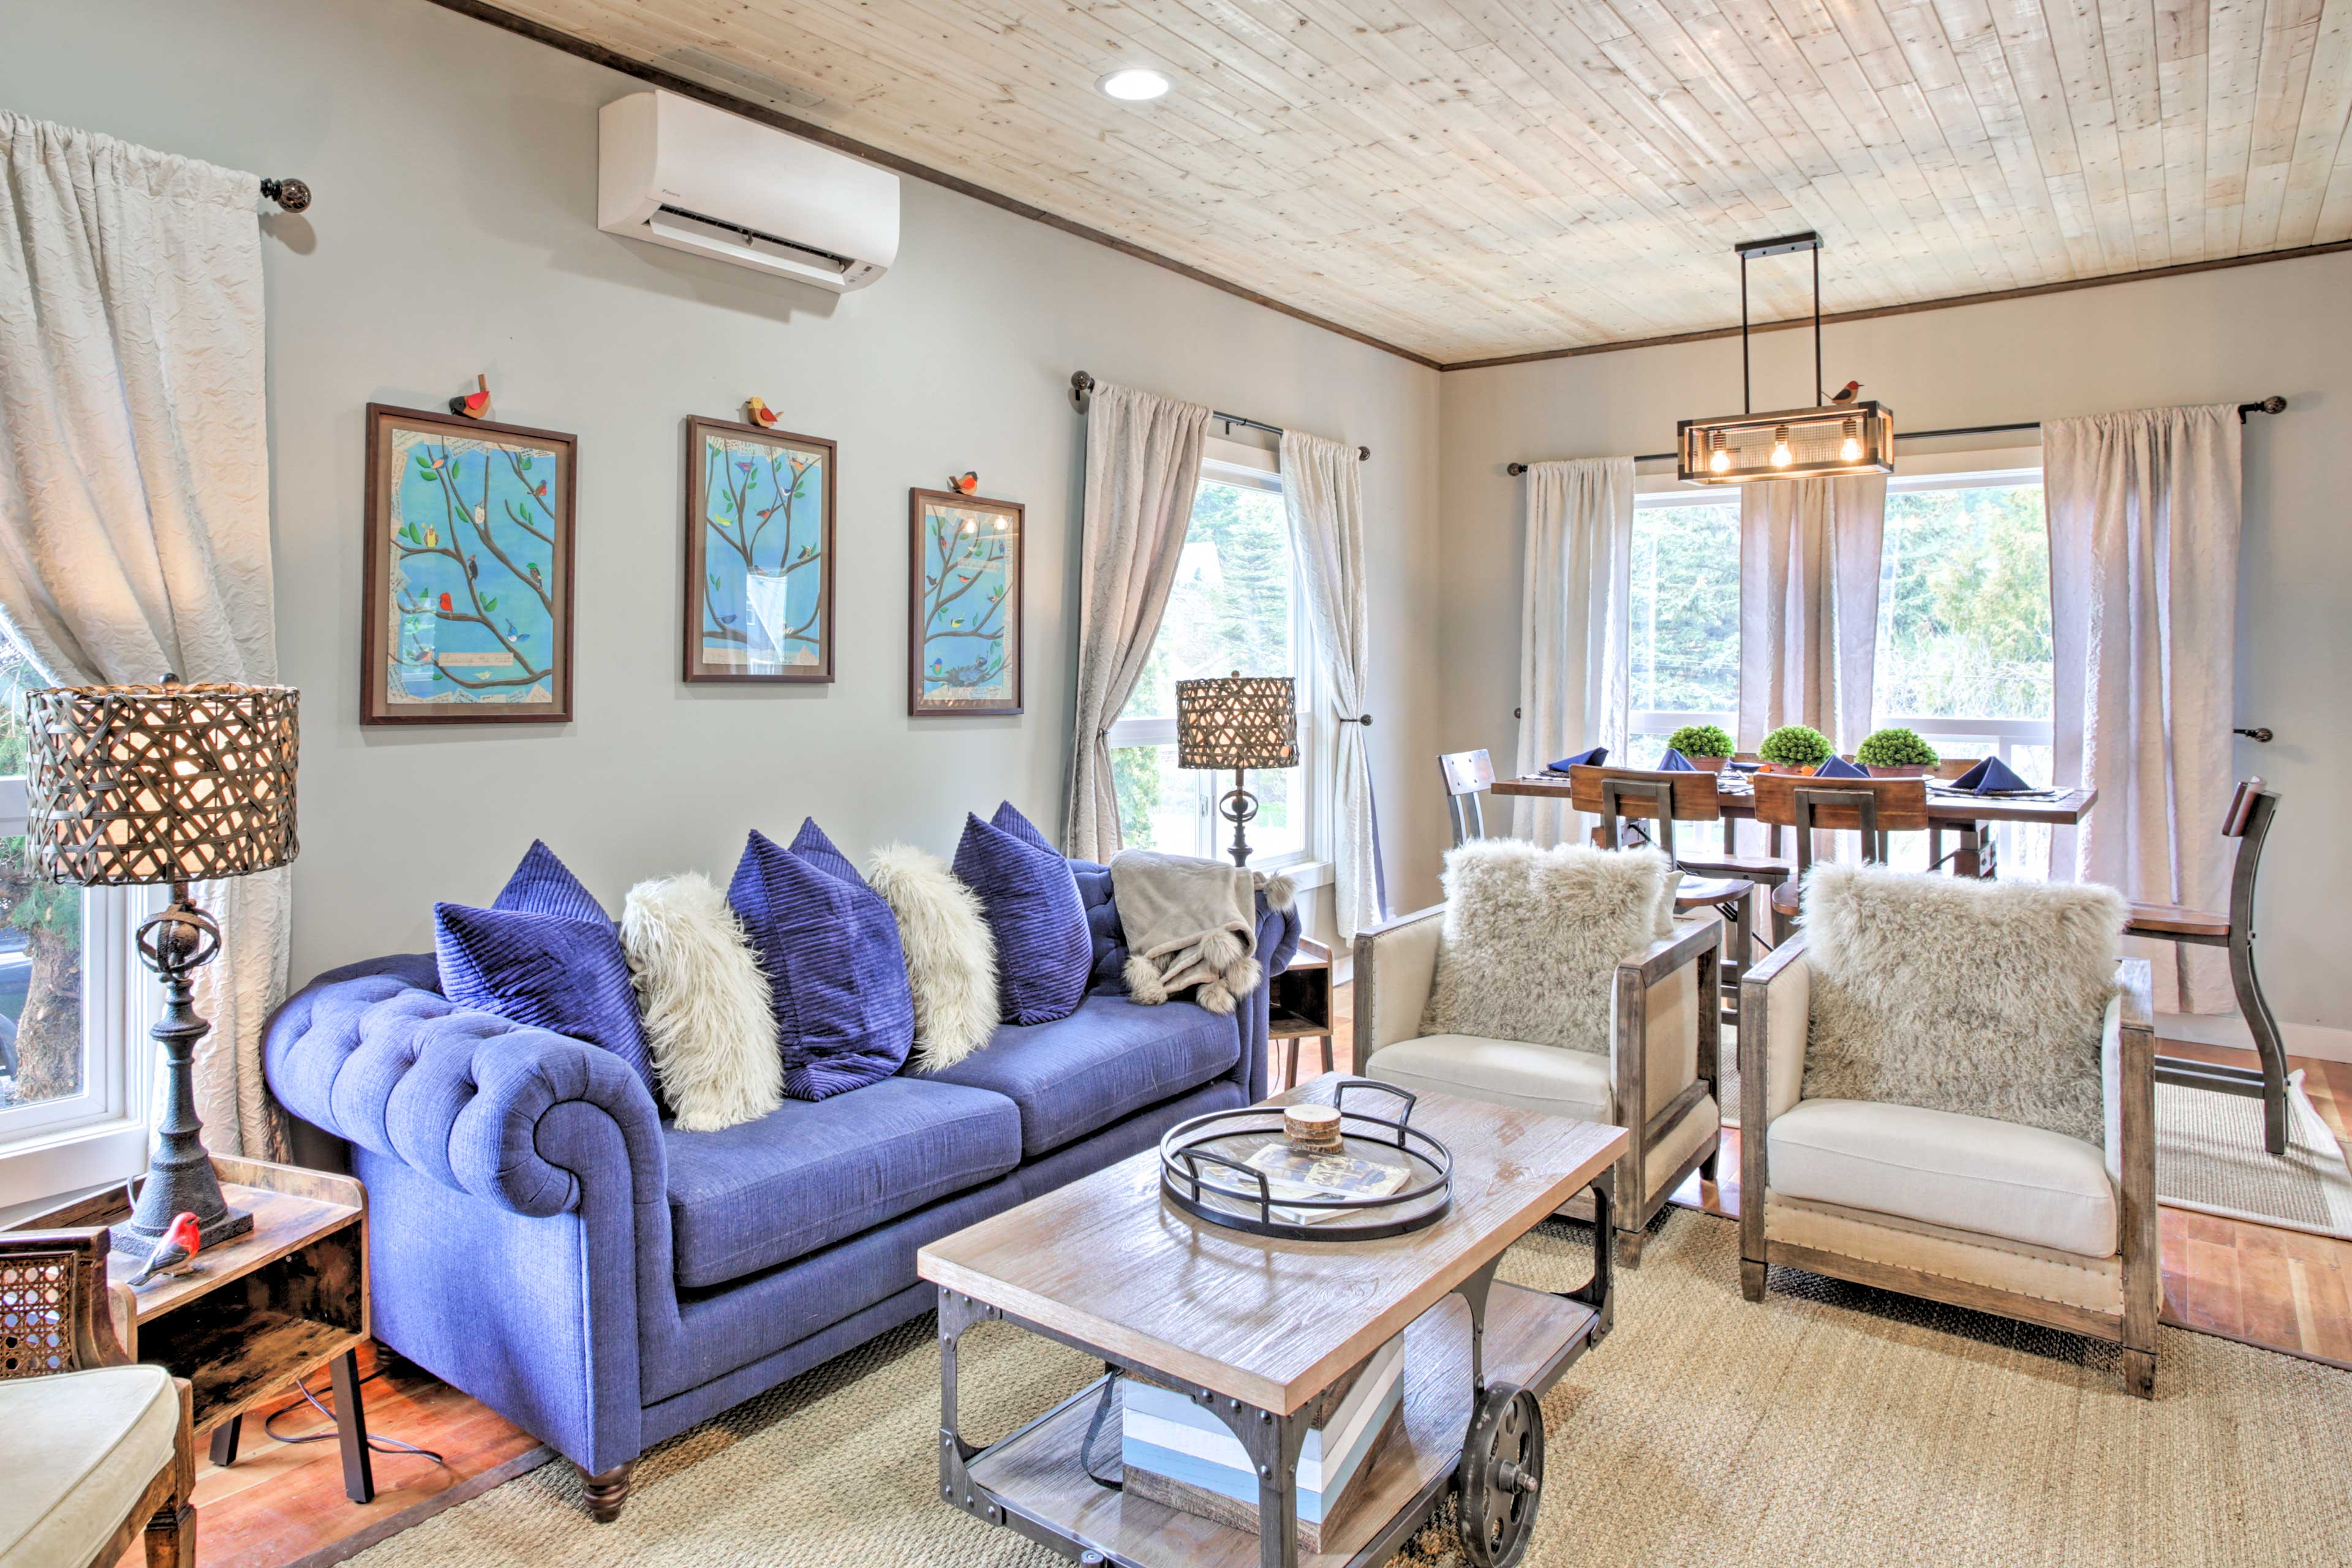 The 4-bedroom, 3-bathroom cottage boasts a stylish interior with sleek detail!